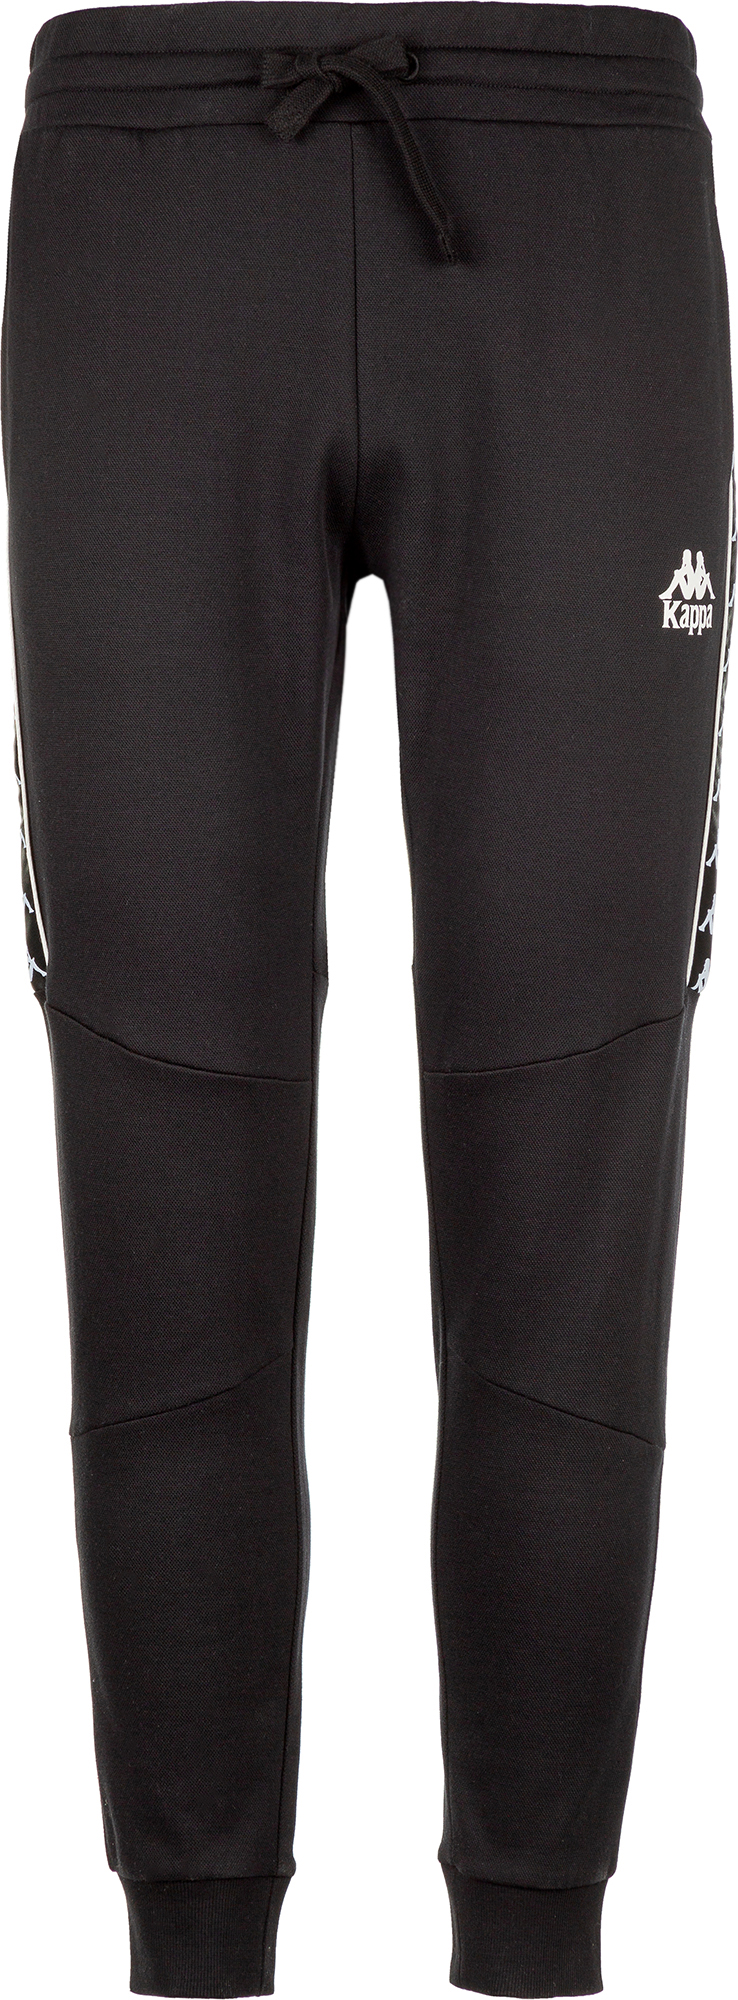 Фото - Kappa Брюки мужские Kappa, размер 56 брюки мужские kappa men s trousers цвет графитовый 304jr00 3a размер xl 52